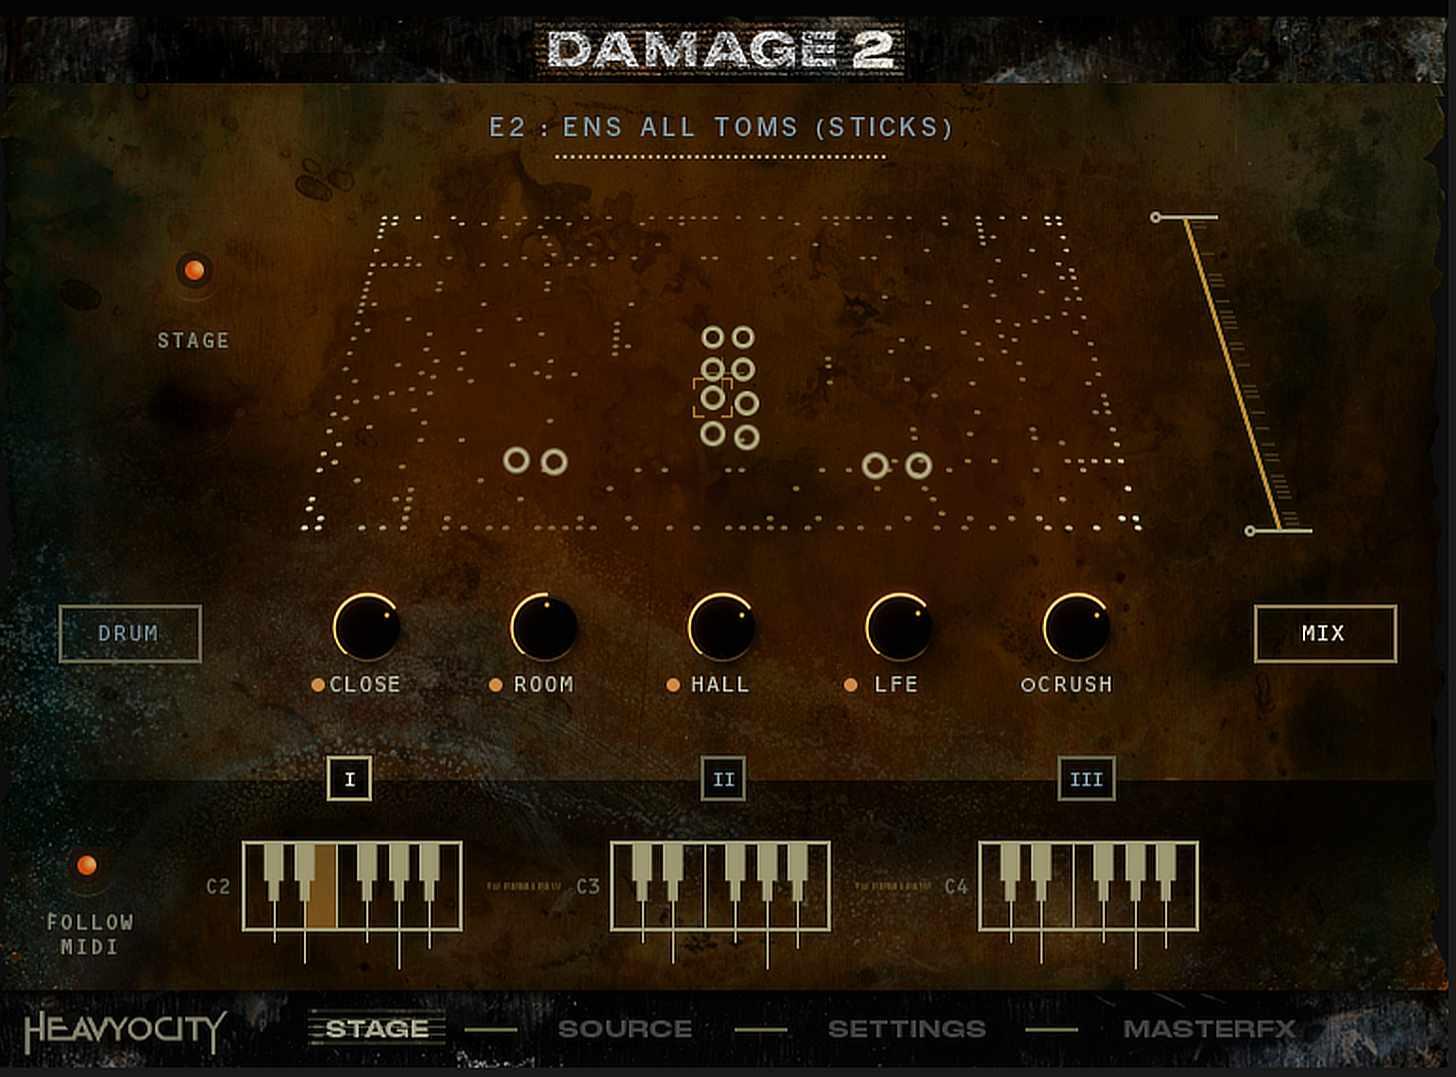 Heavyocity Damage 2 Stage Screen